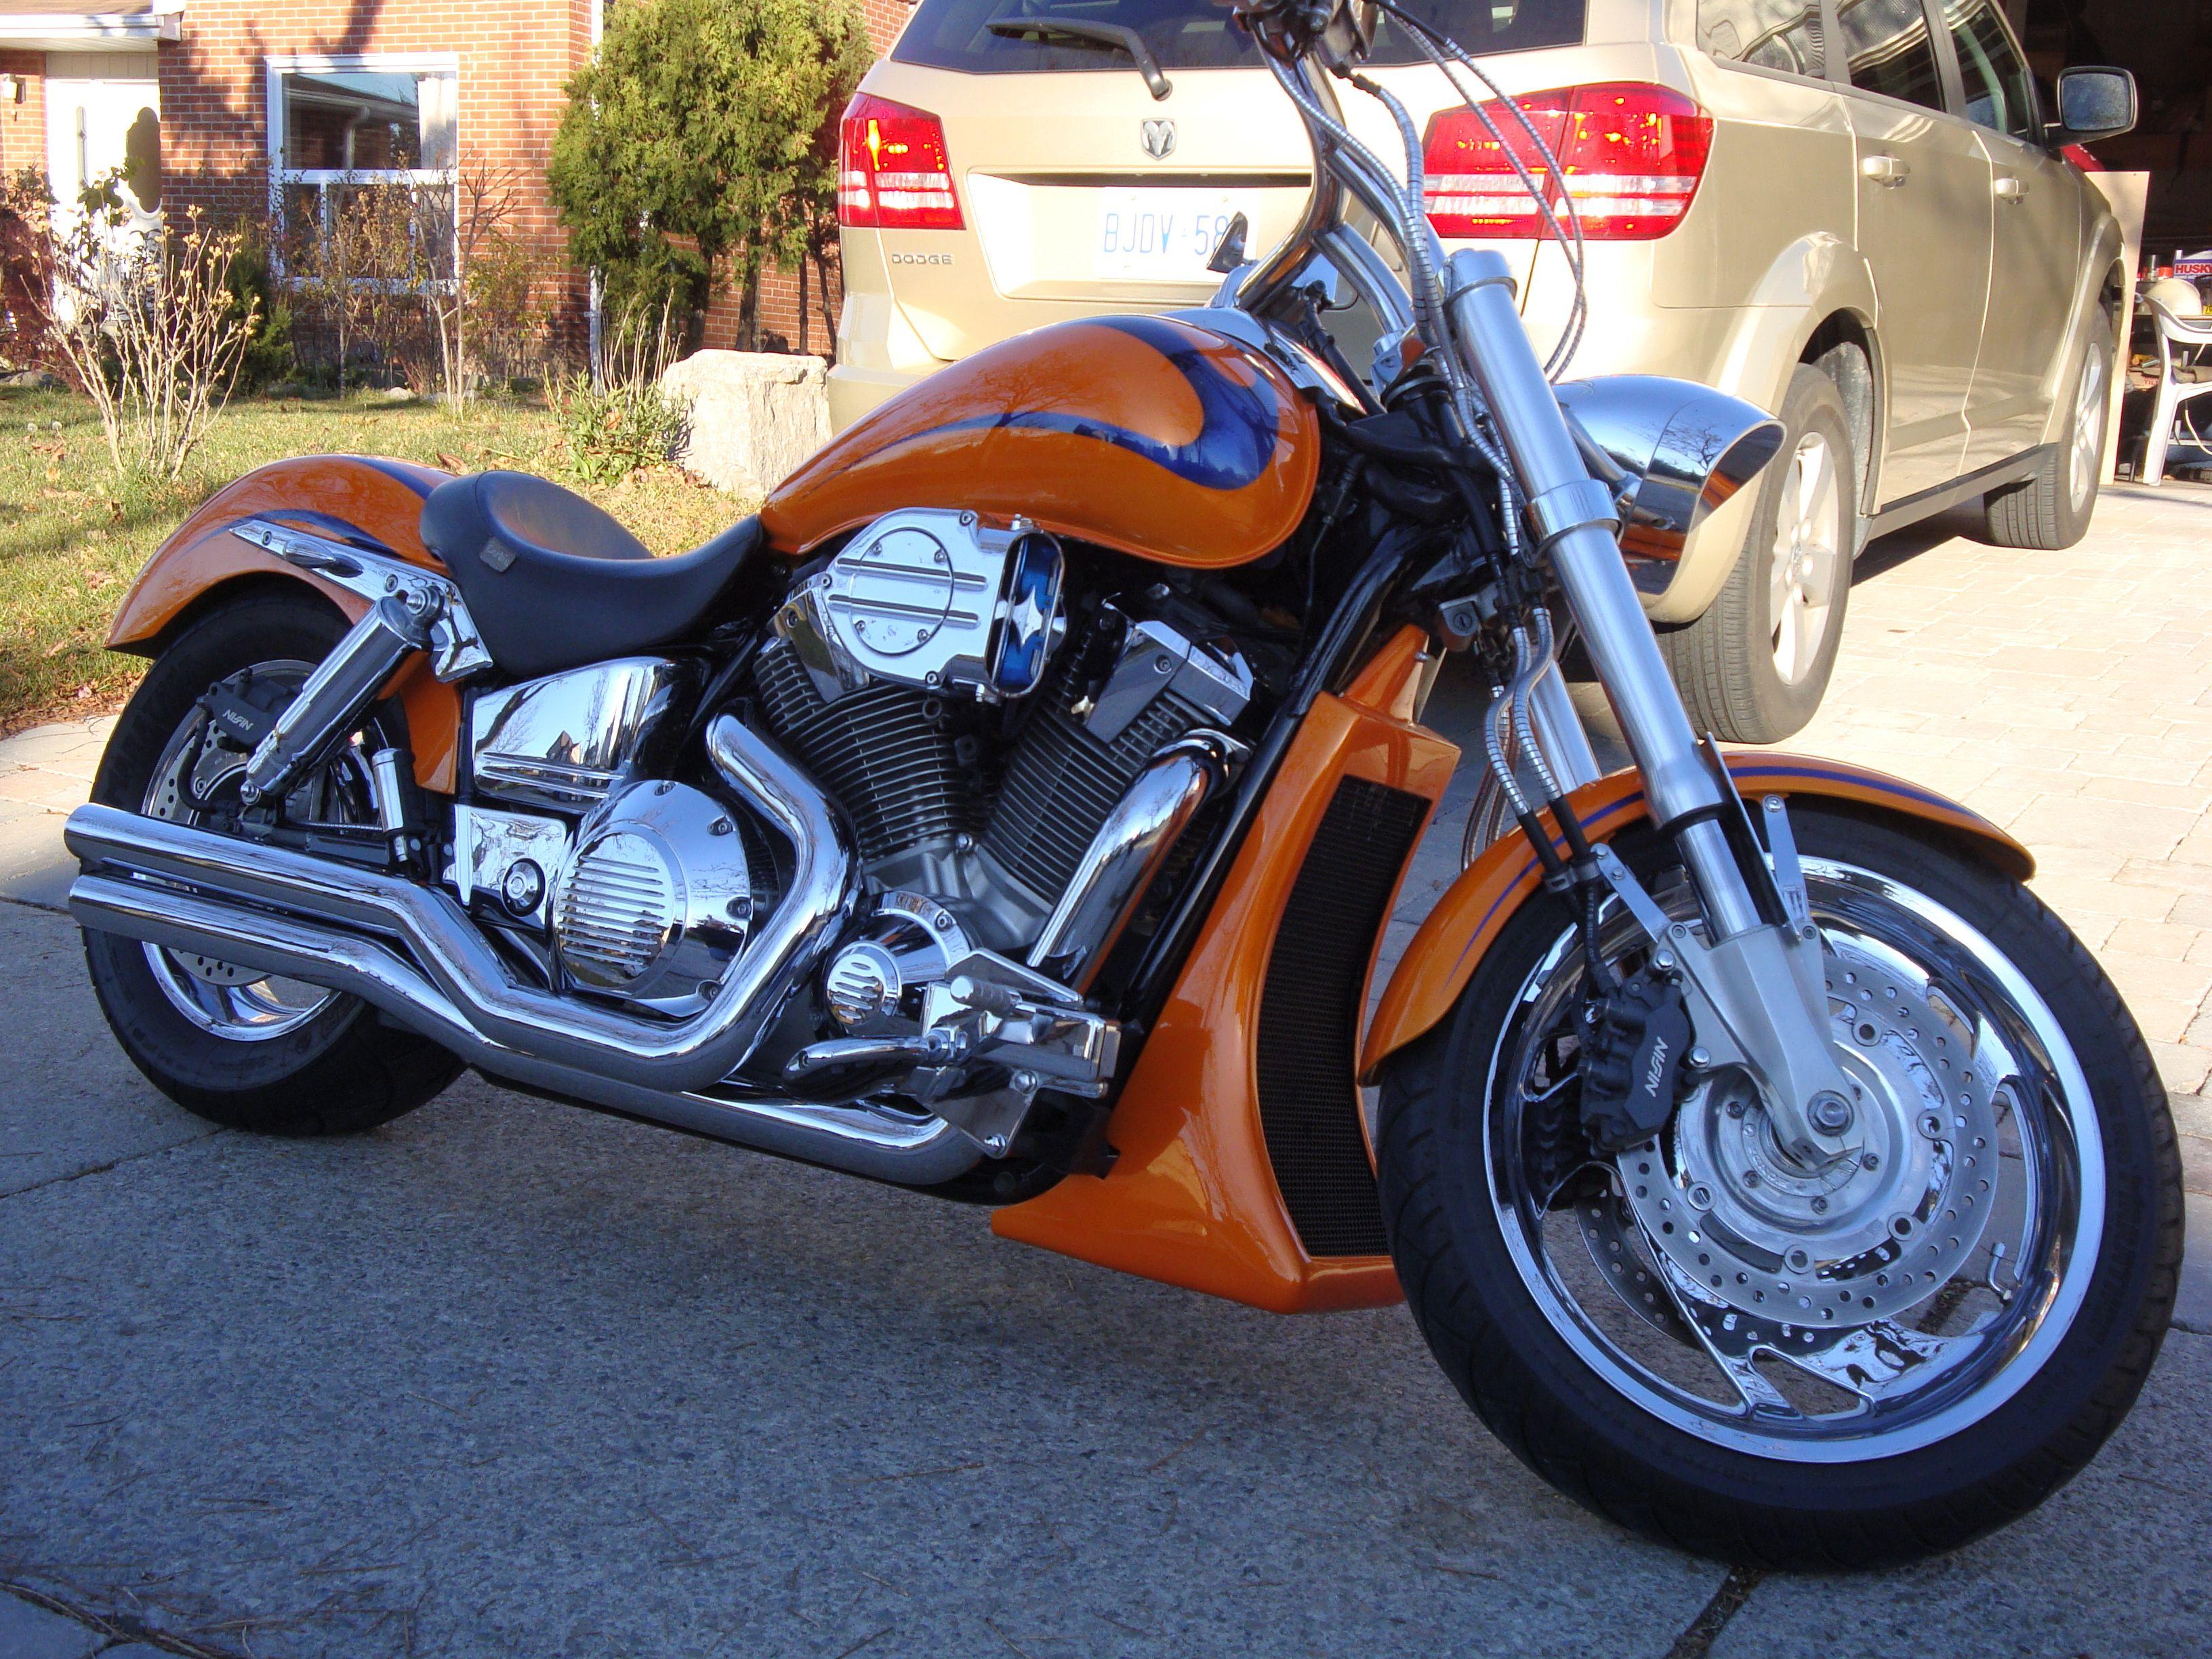 honda vtx 1800 honda motorcycles custom motorcycles custom bikes cars and motorcycles  [ 3264 x 2448 Pixel ]